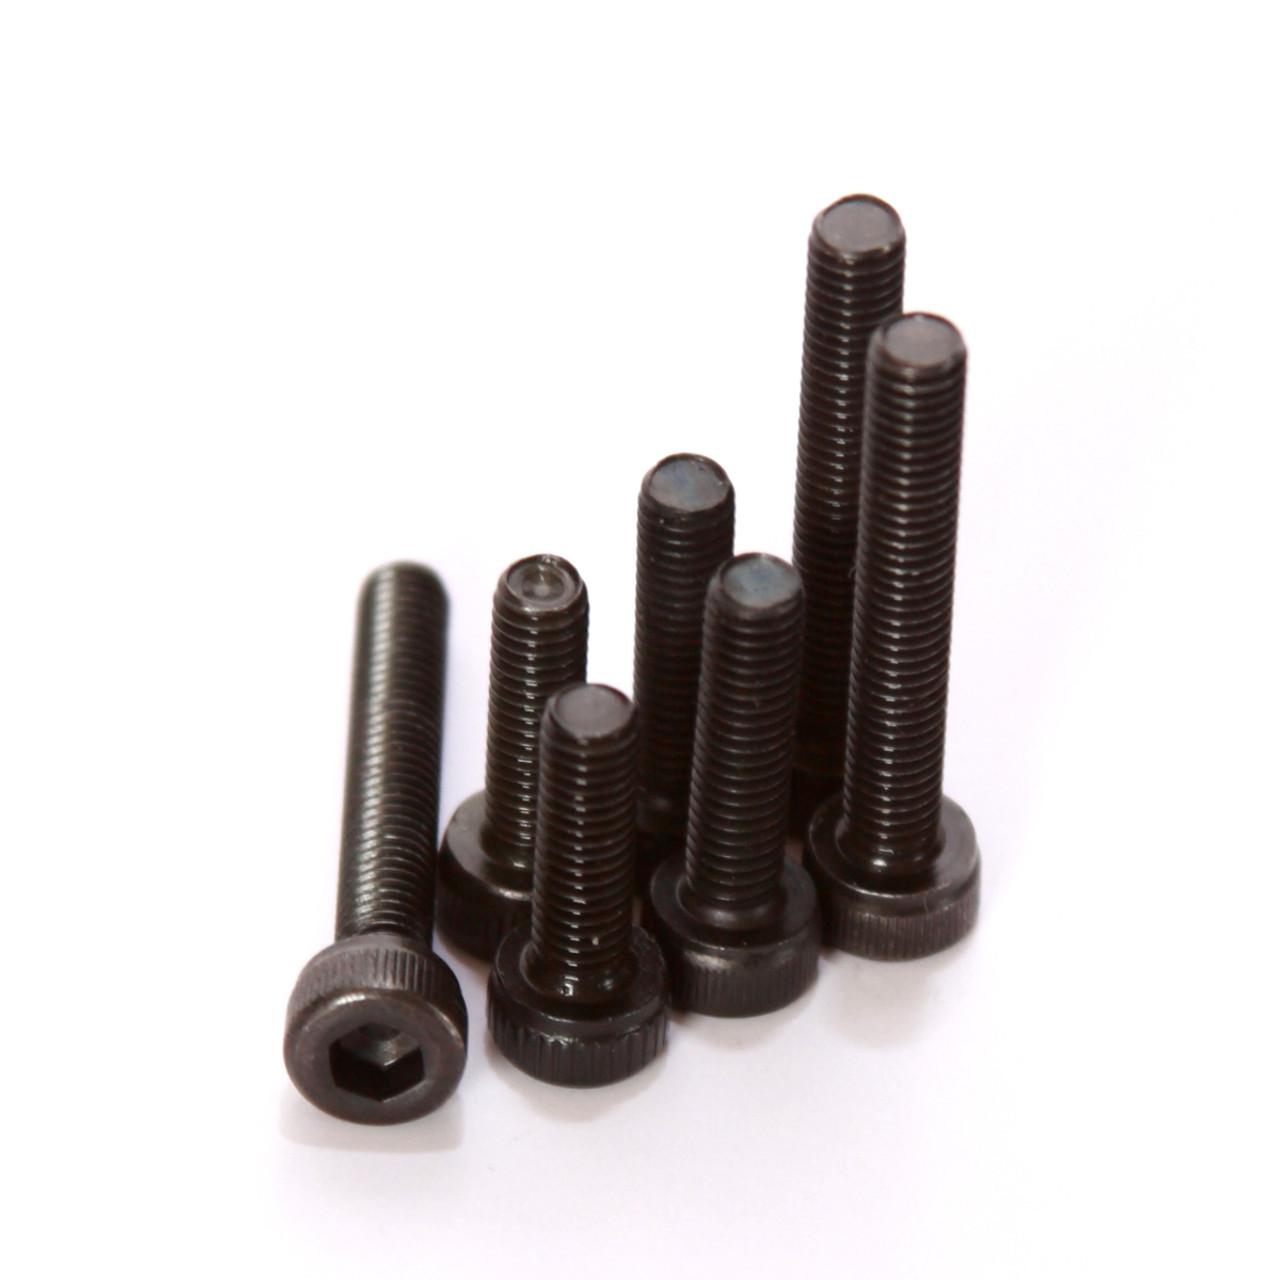 Hardware 3x16 mm SC Screws (10 Pack)